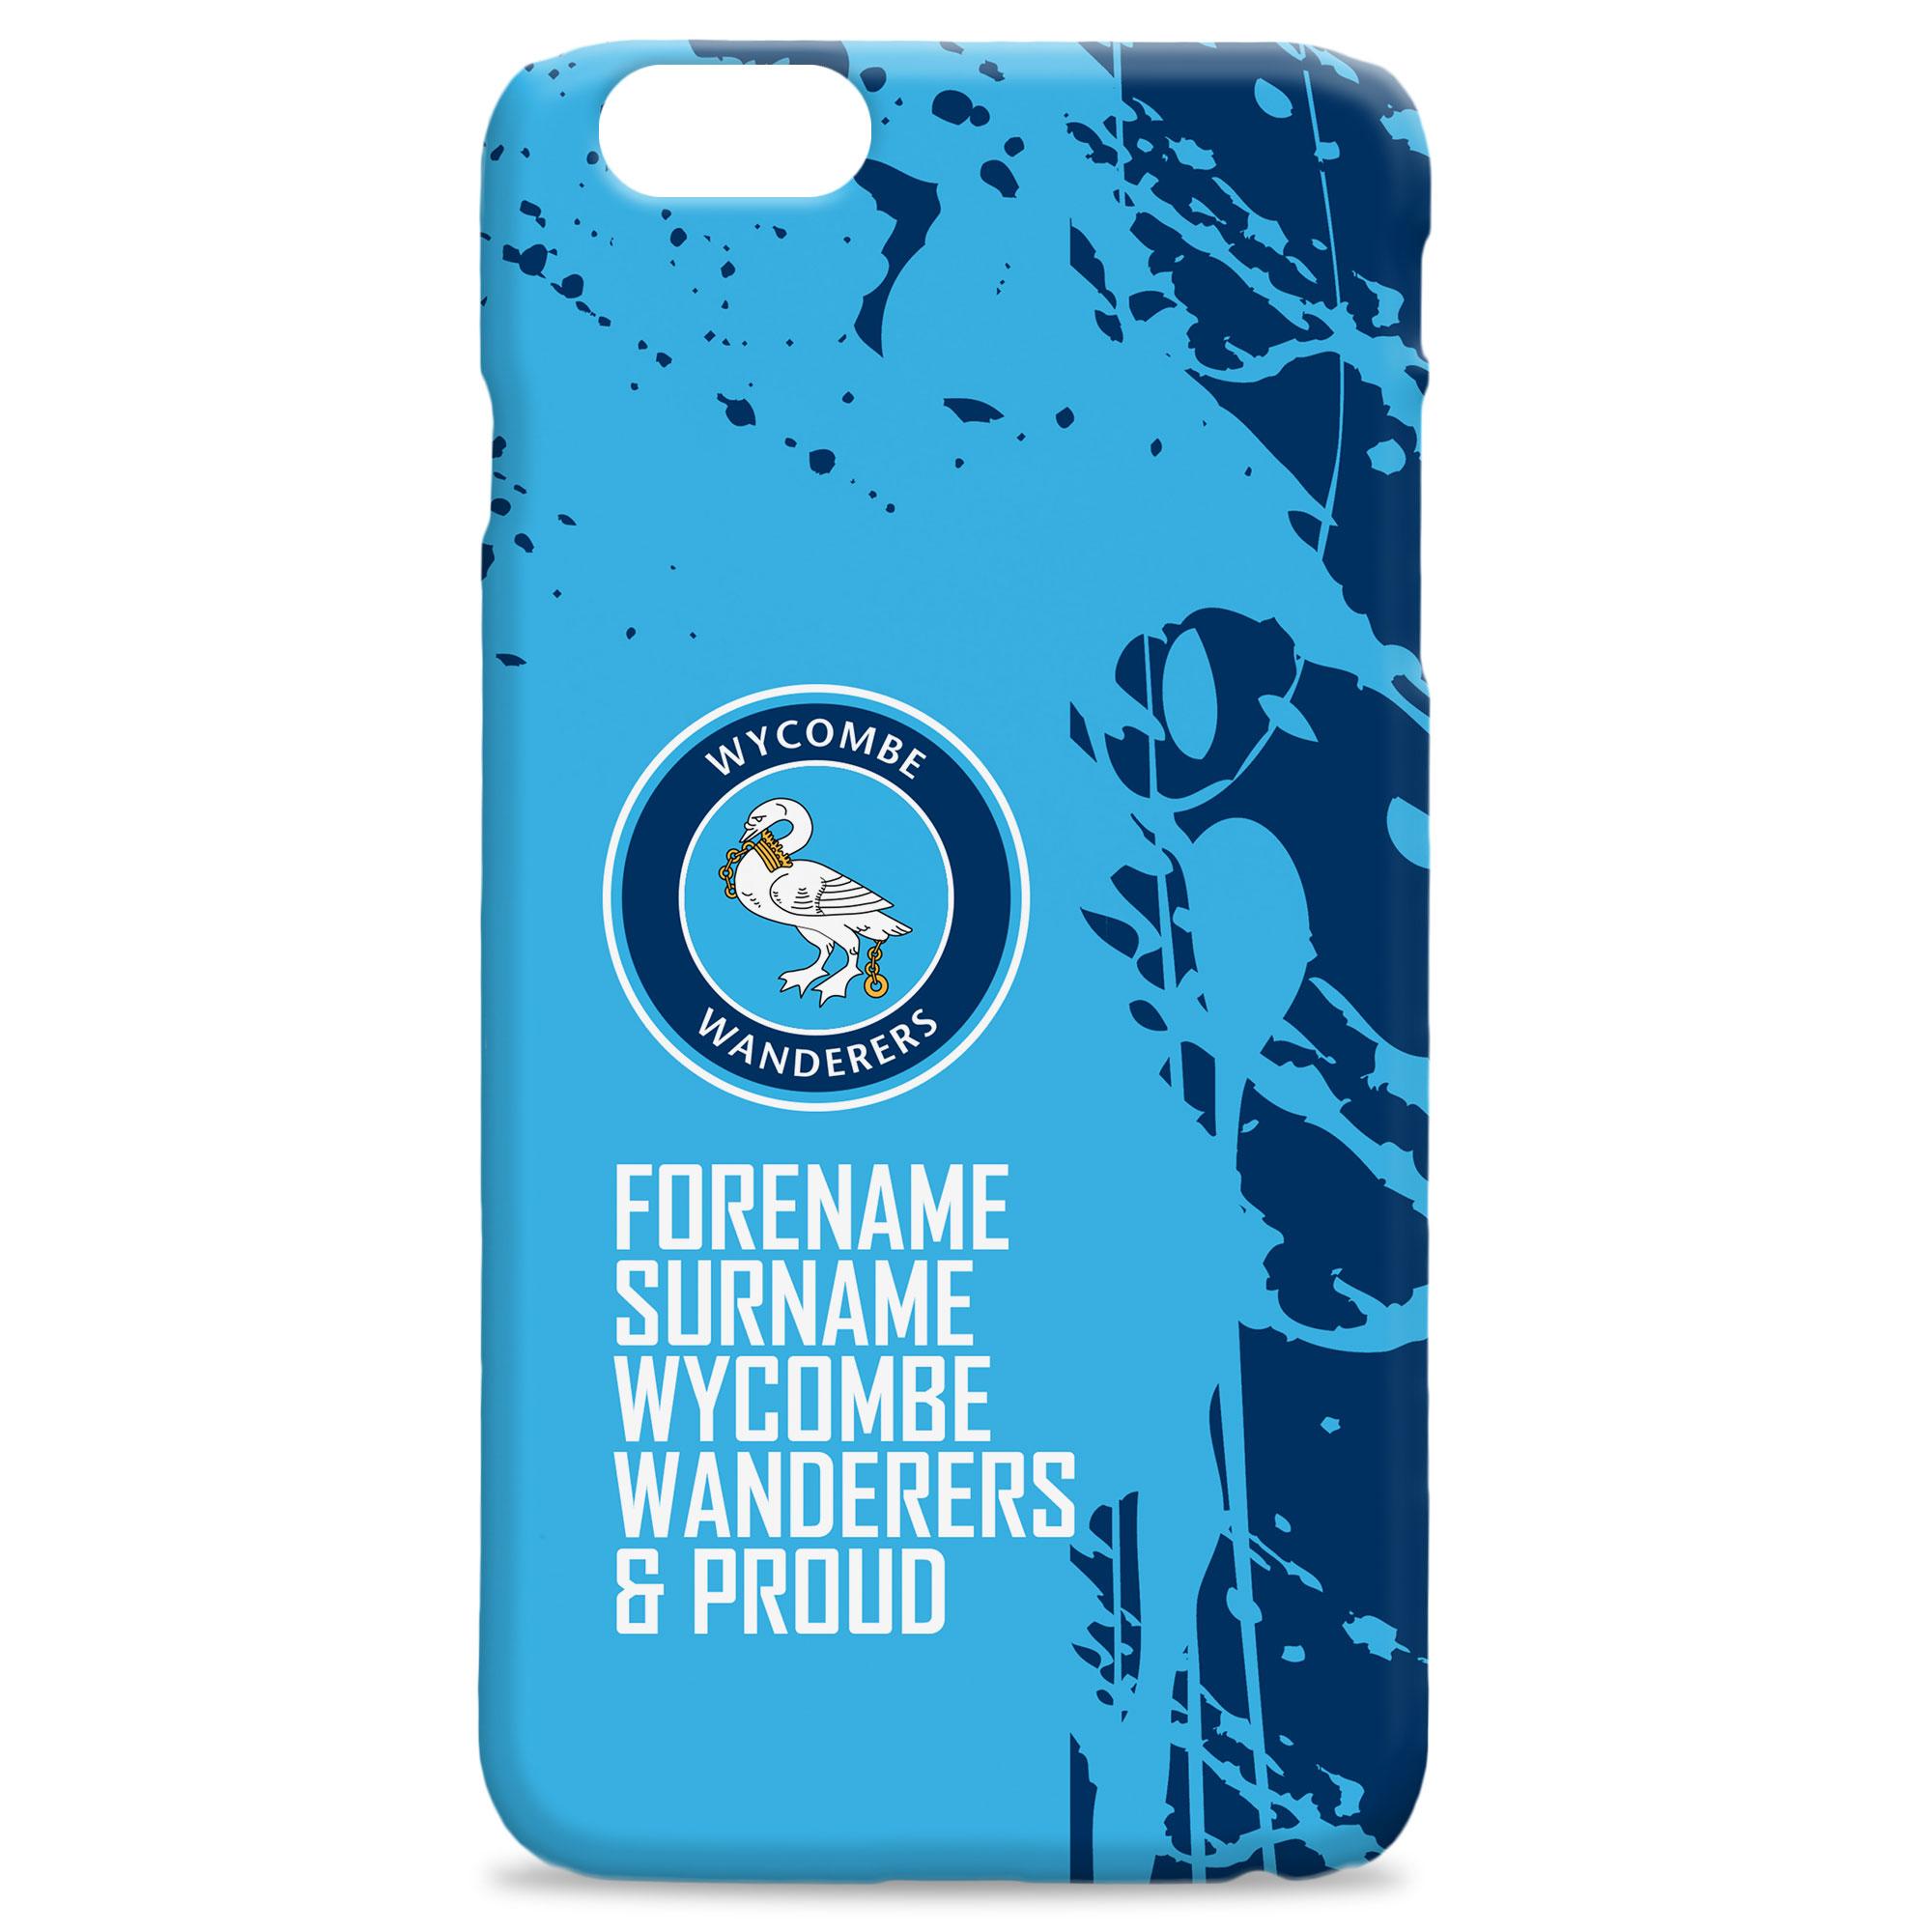 Wycombe Wanderers Proud Hard Back Phone Case